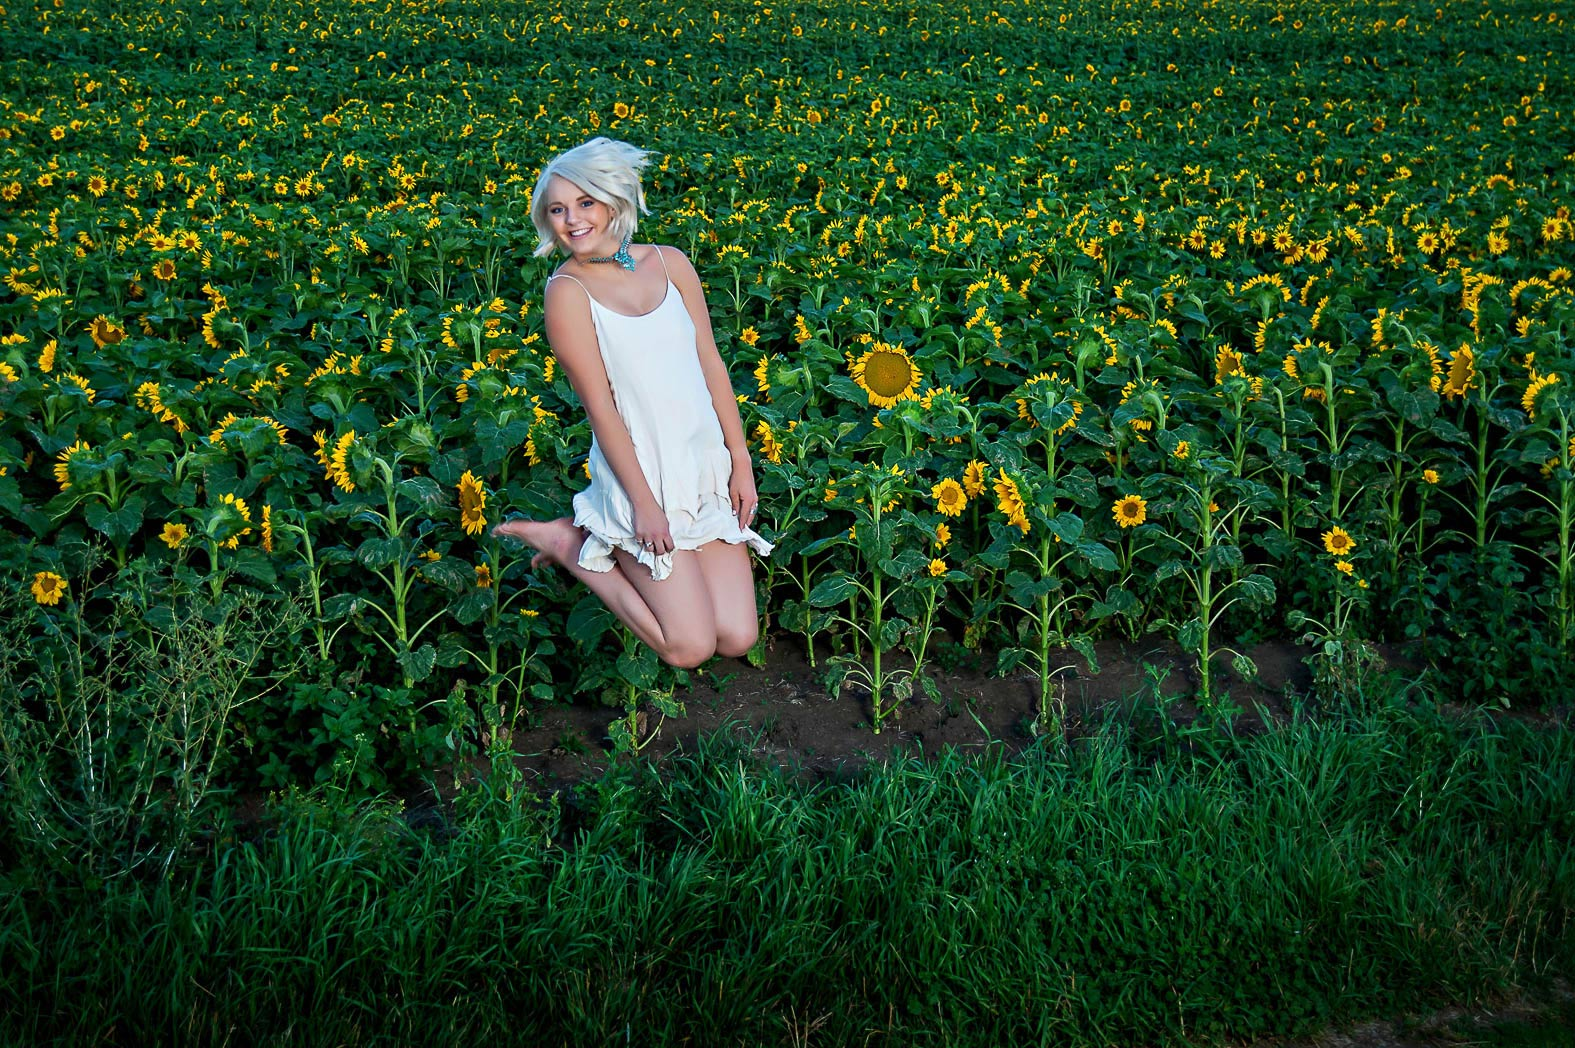 karina-sunflowers-senior-pictures-country-girl-farm-photonuvo